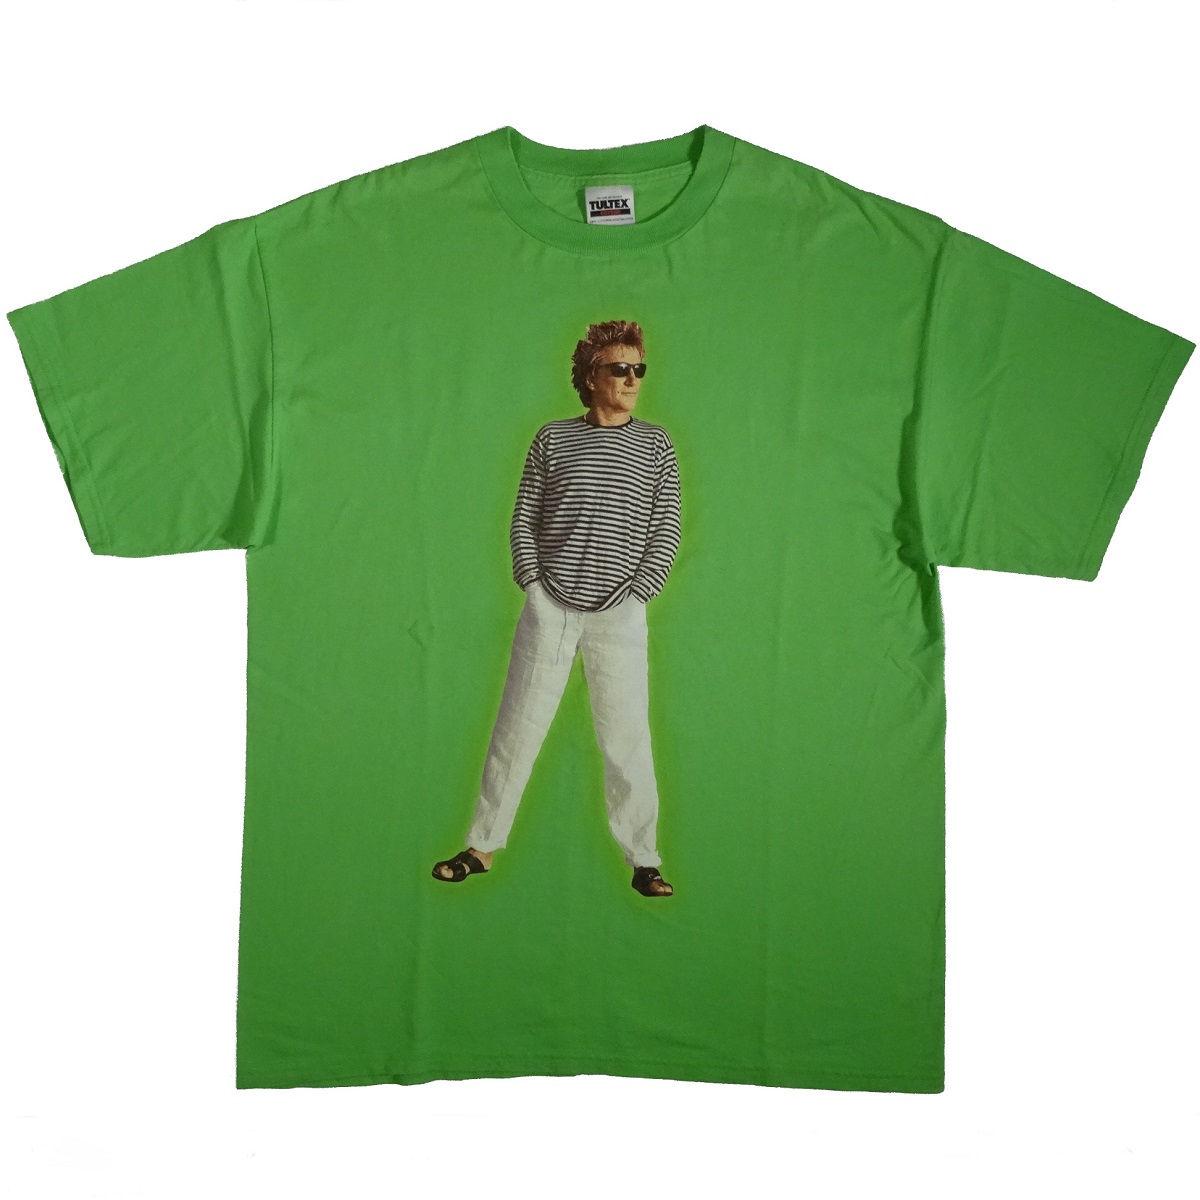 Rod Stewart Vintage 1999 Tour T Shirt Front